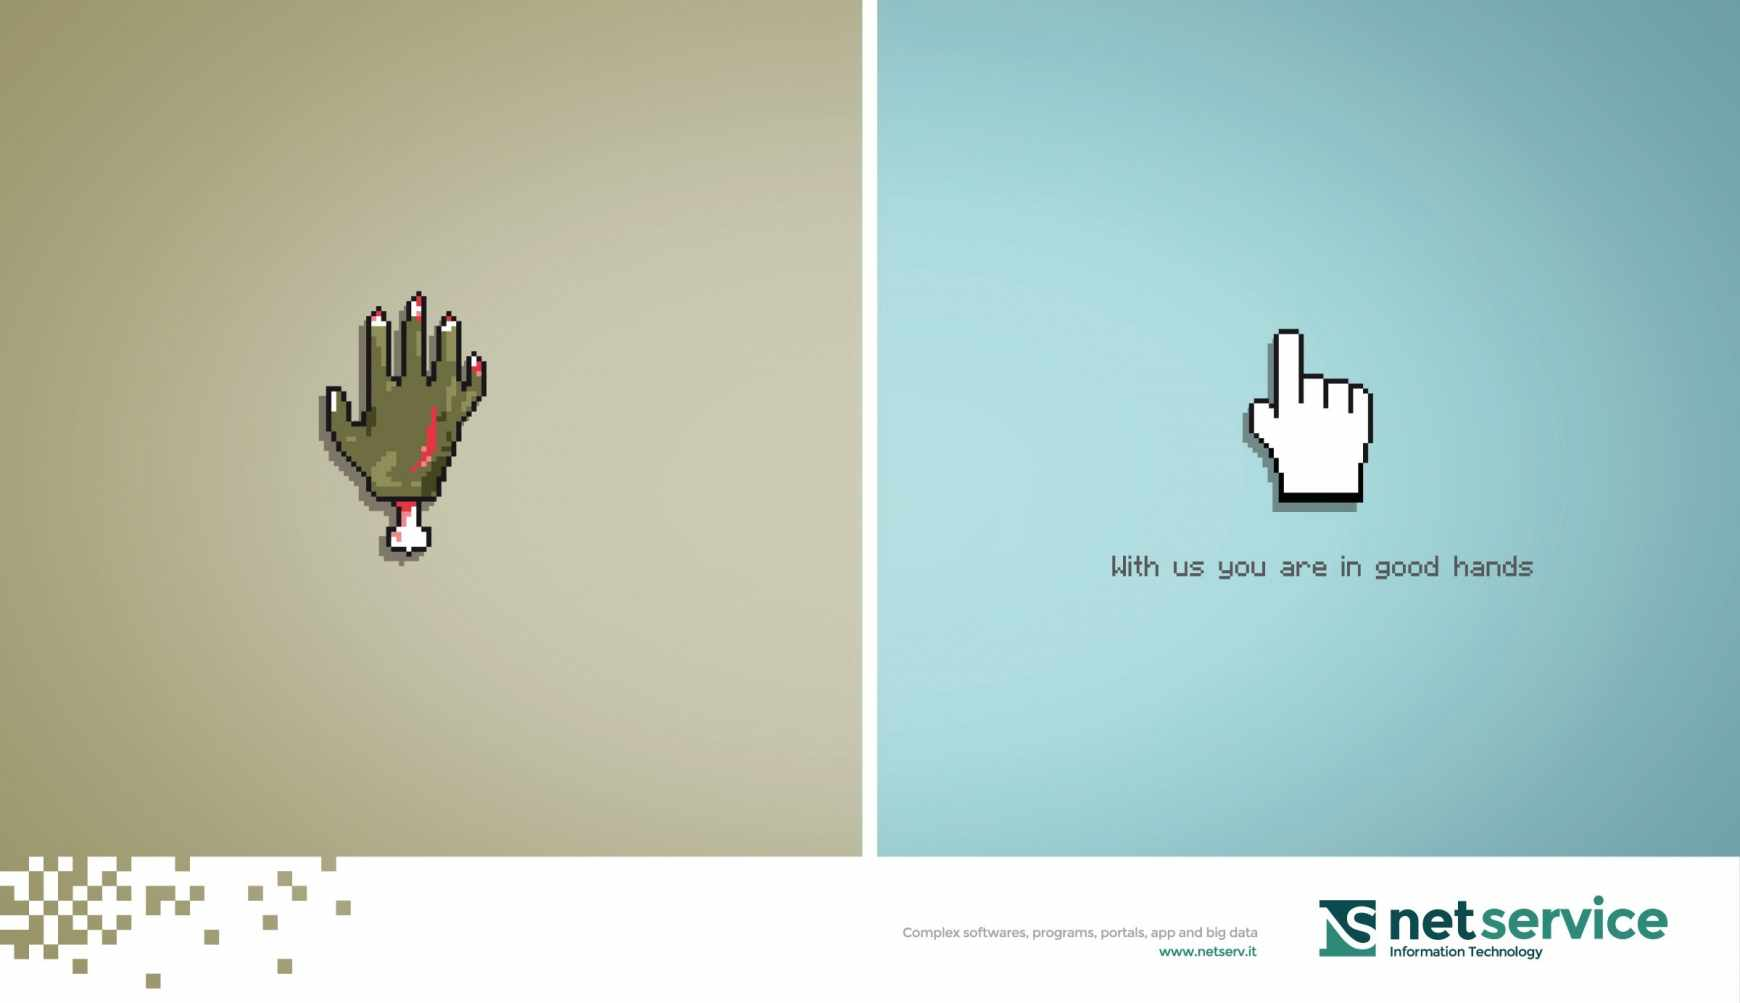 Netserv: Buenas manos.